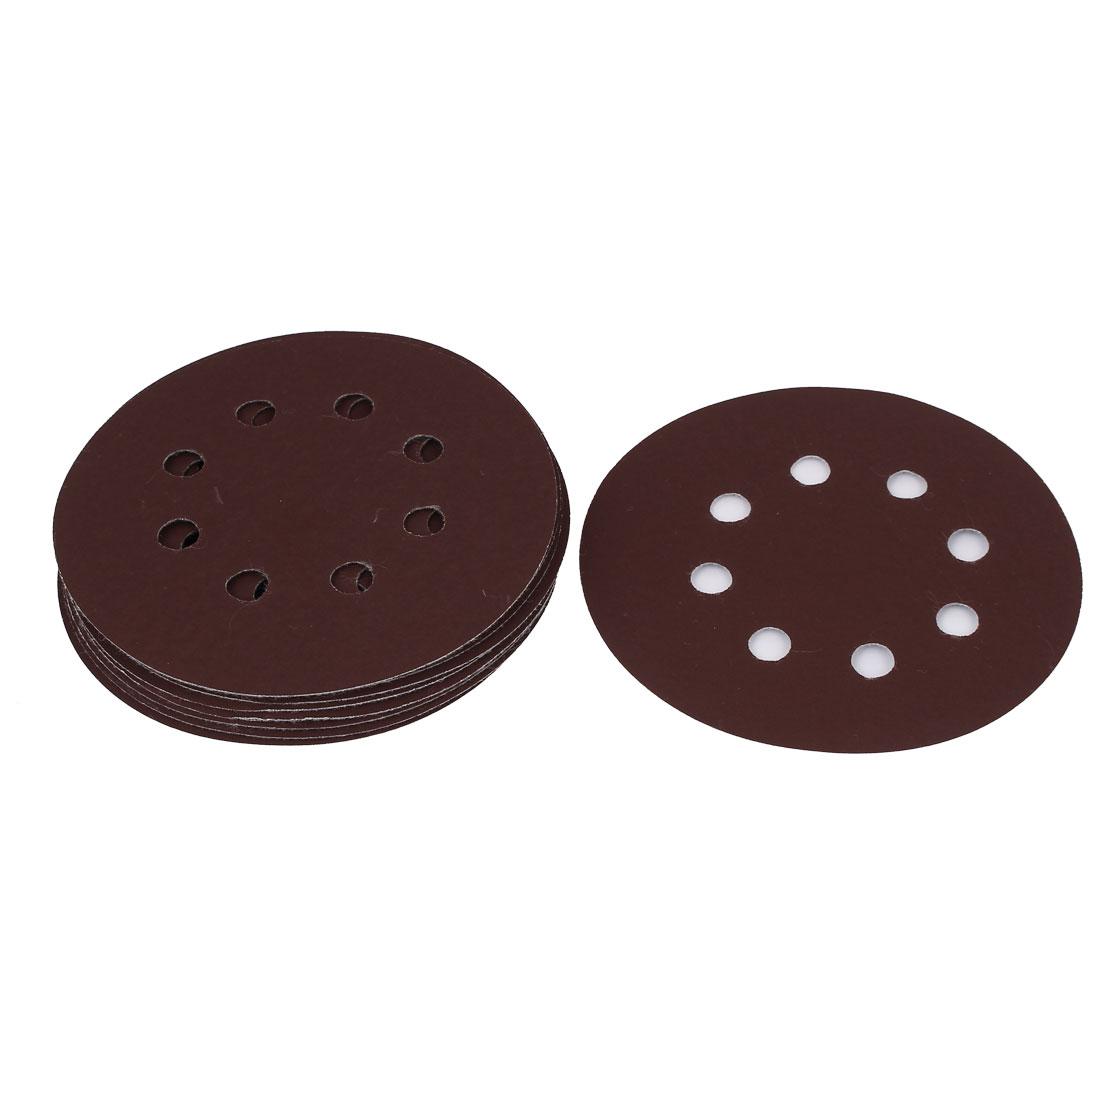 125mm Dia 8 Hole 1500 Grit Abrasive Grinding Hook and Loop Sanding Discs 10pcs